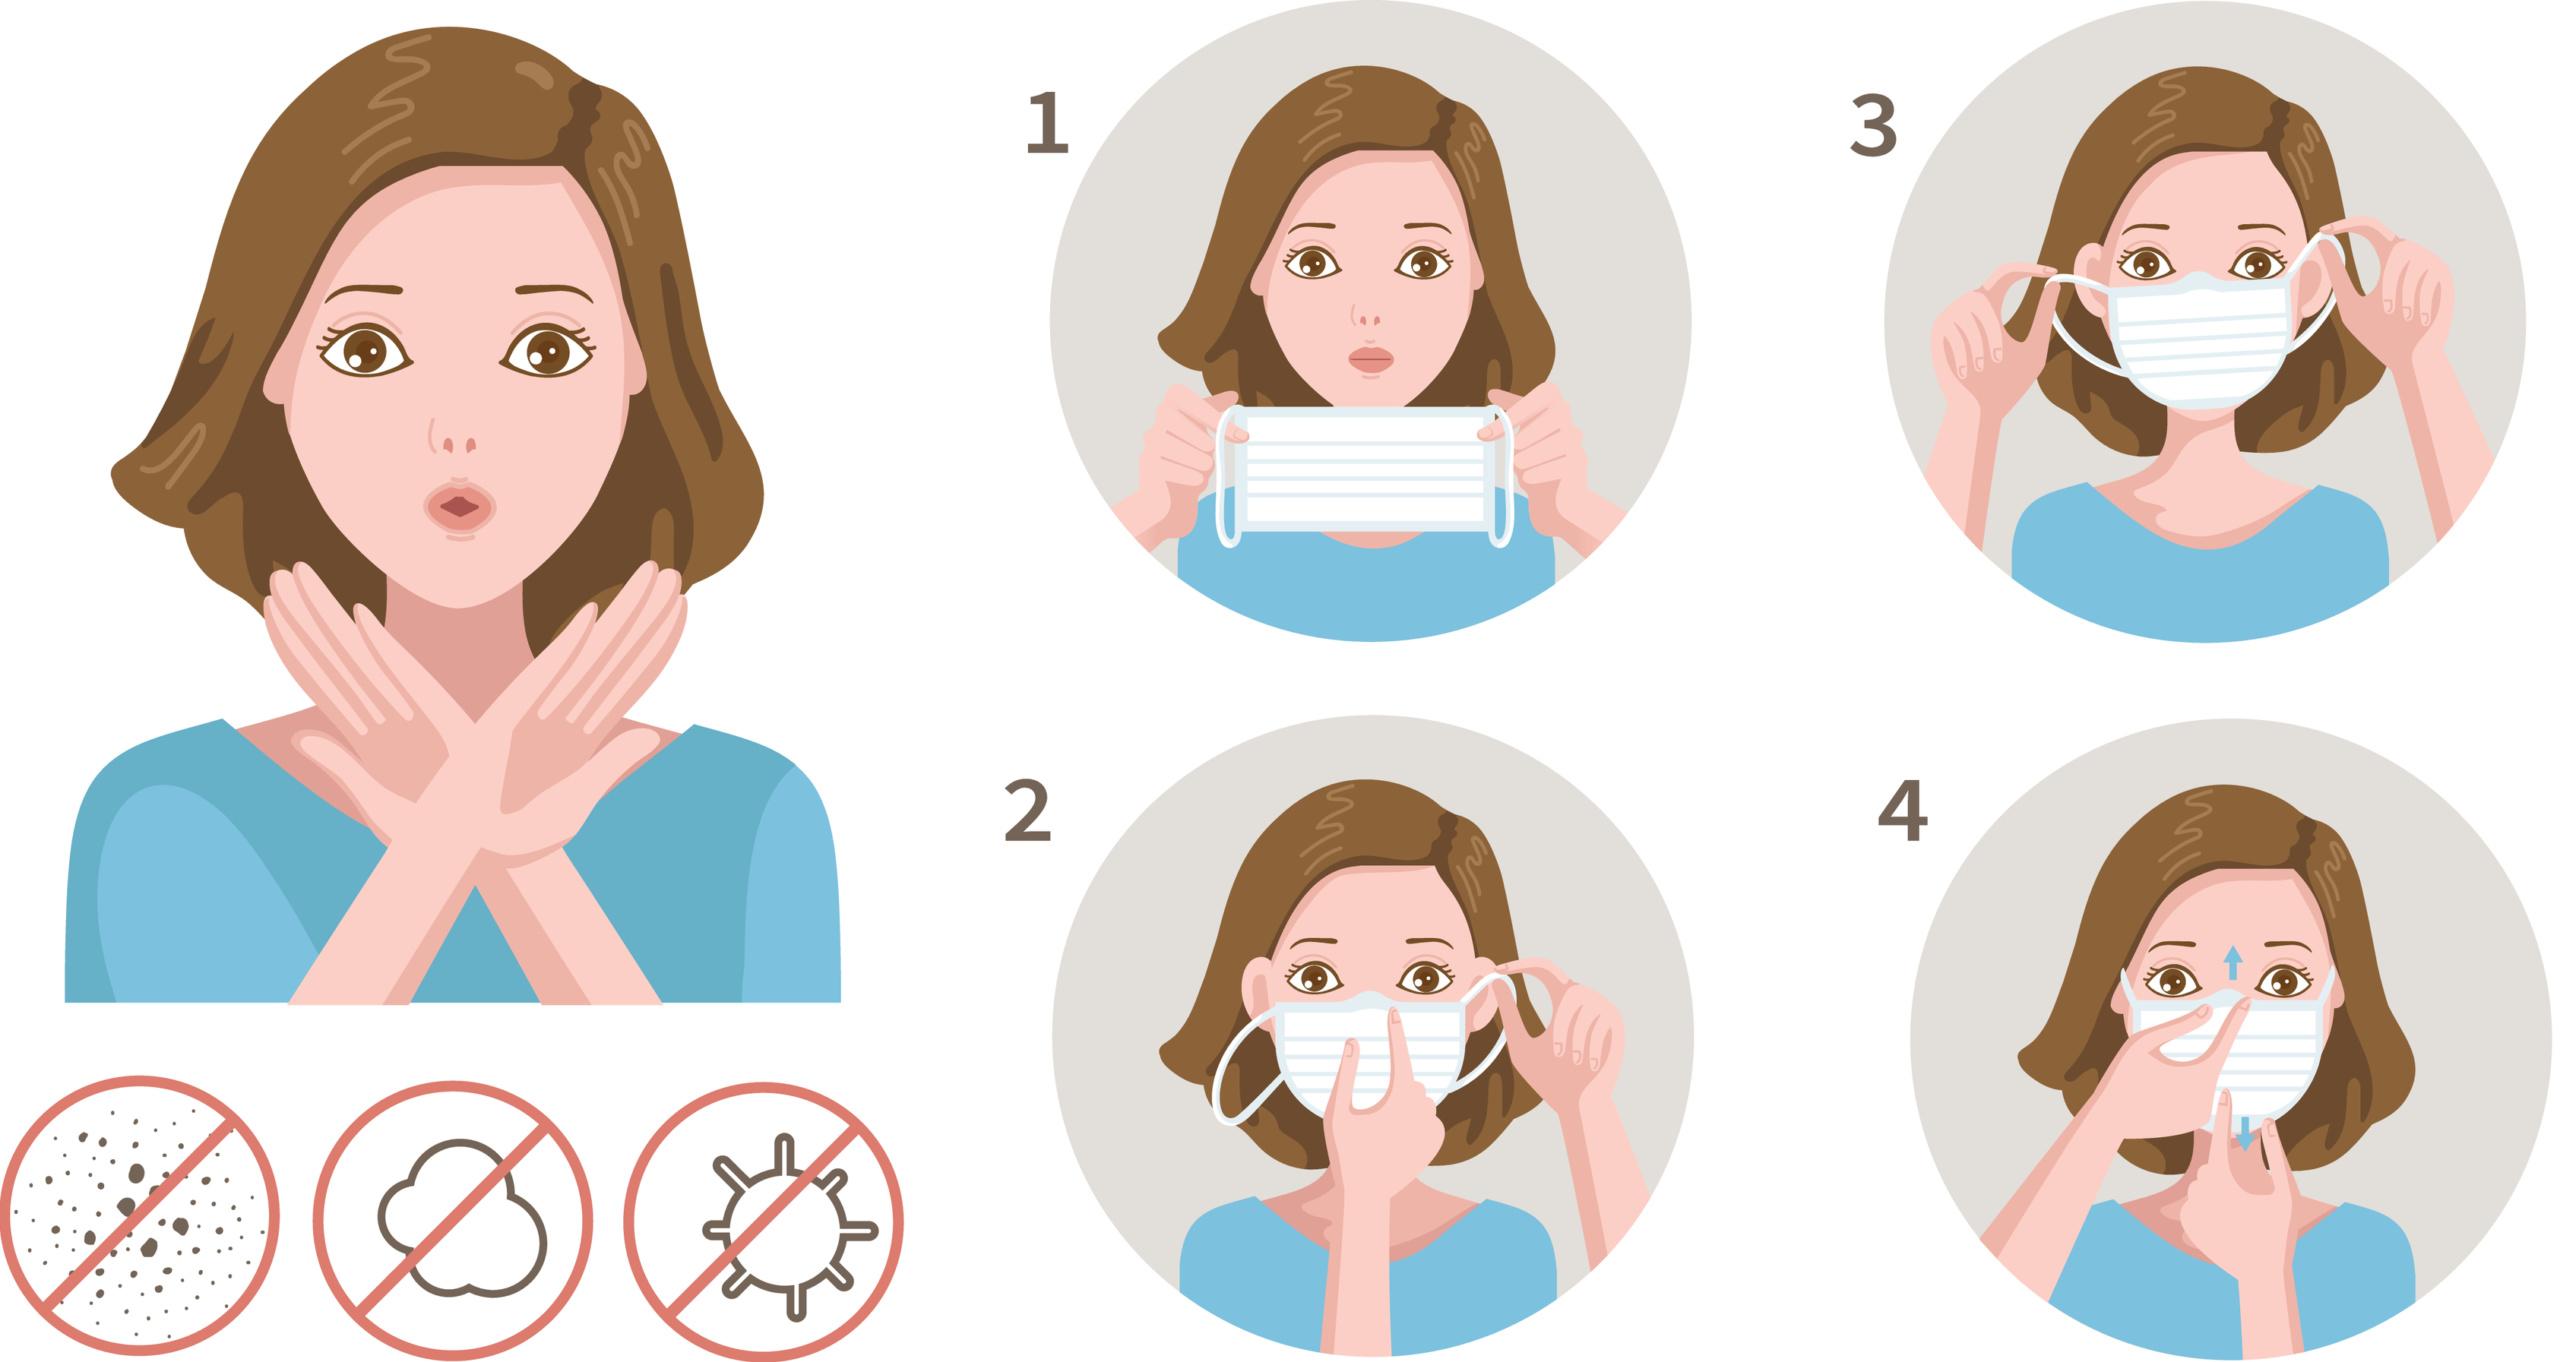 Come indossare mascherina